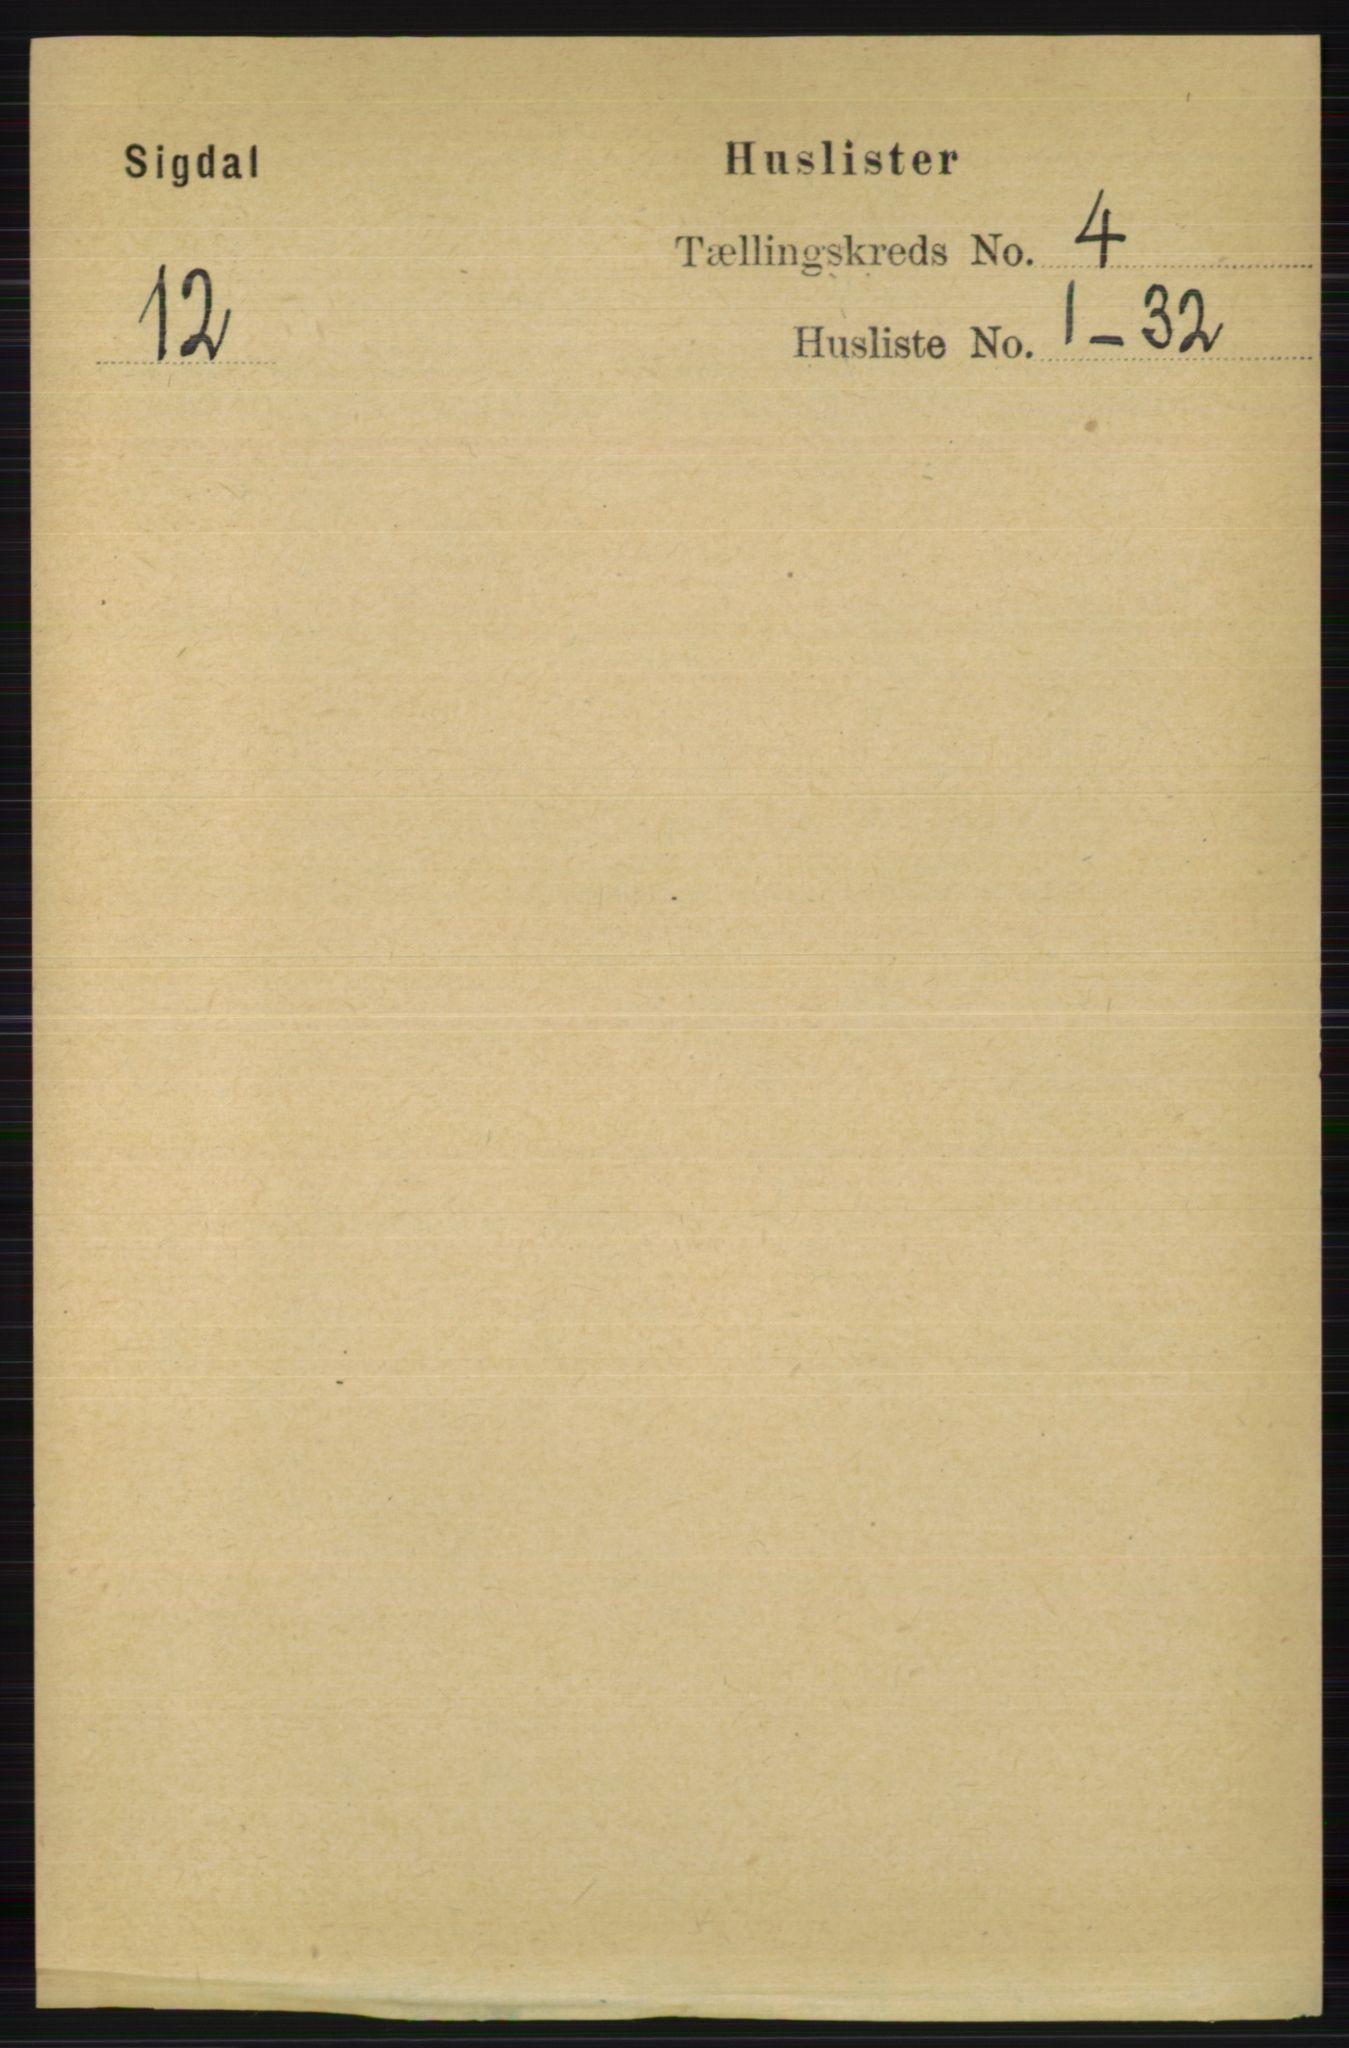 RA, Folketelling 1891 for 0621 Sigdal herred, 1891, s. 1614